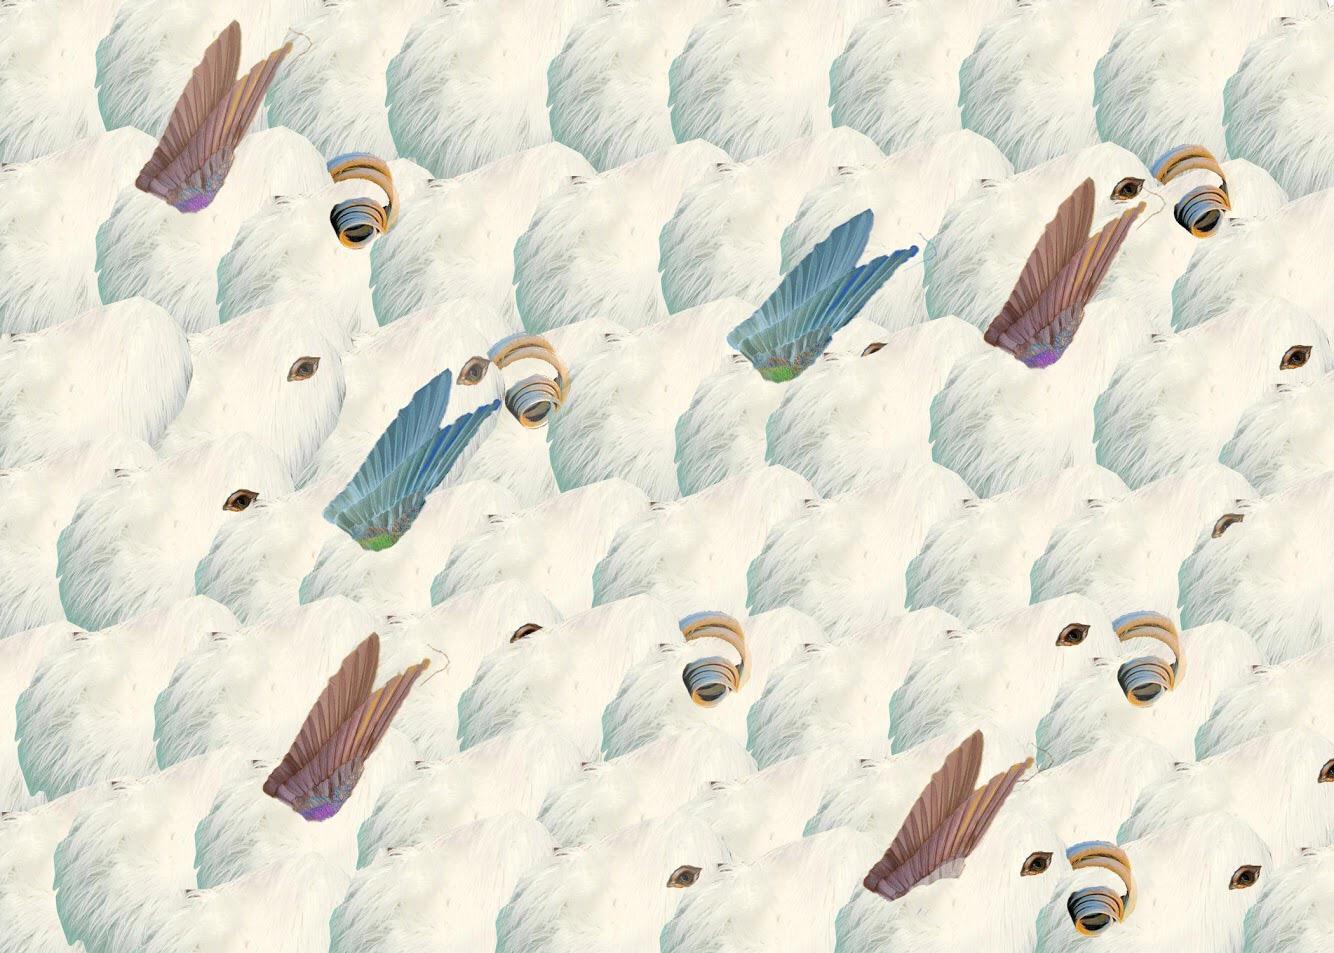 Volume IV: Metamorphosis - Including works from contributors Uma Arizkun, Taylor Ayling, Trevor Brown, Eleanor Capaldi, Gabriella Carr, Dalila Eslava, Matt Fatt, Carla Gabarda, Rebecca Howard, Alice Hume, Sarah Hume, Sarah Lutz, Chris Mawson, Sarah McCrorey, Maya Milton, Ashuni Pérez, Riccithegod, Bethan Screen, Imogen Stirling, Izzi Vasquez, and Sadie Williams.Exclusive interviews with portrait photographer Mayoo Secchi, the most enthusiastic person you'll ever meet Sam Dunstan, Argentinian chamelon incarnate Augusto Zaquetti, and British actor Robin Paley Yorke.